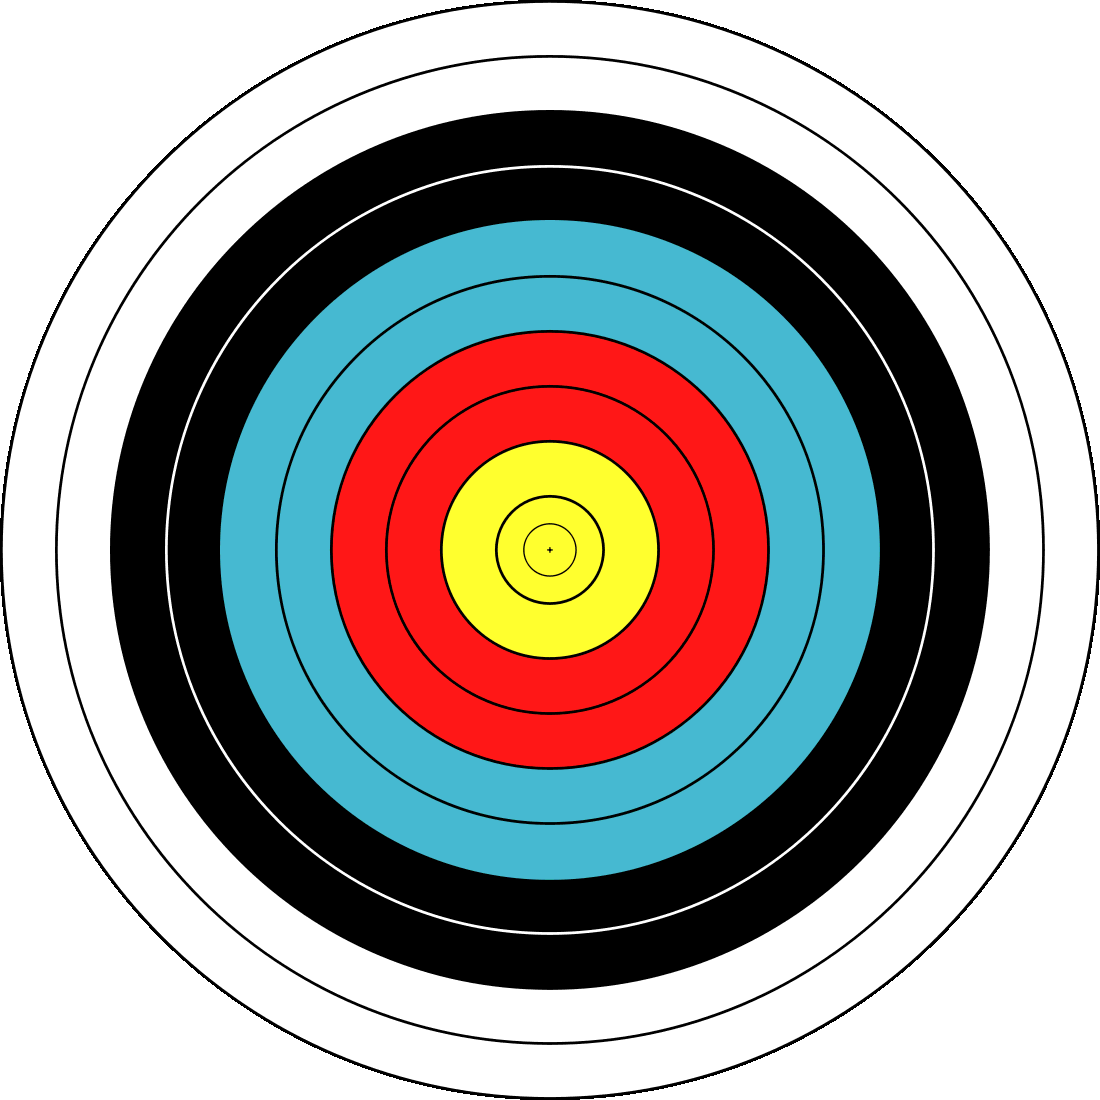 bullseye template printable - archery fita official target recreation sports archery